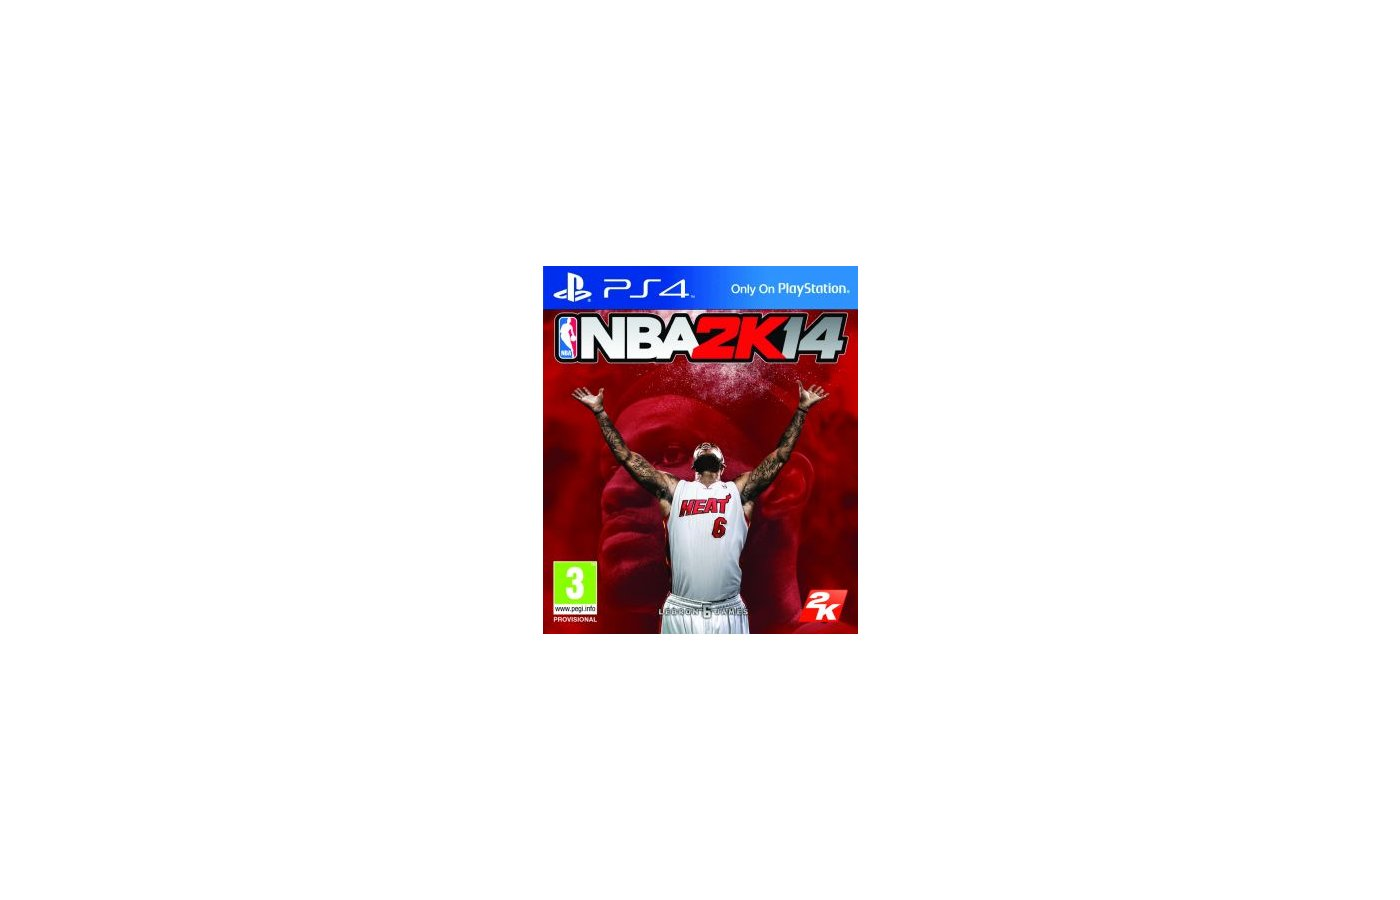 NBA 2K14 (PS4 английская версия)